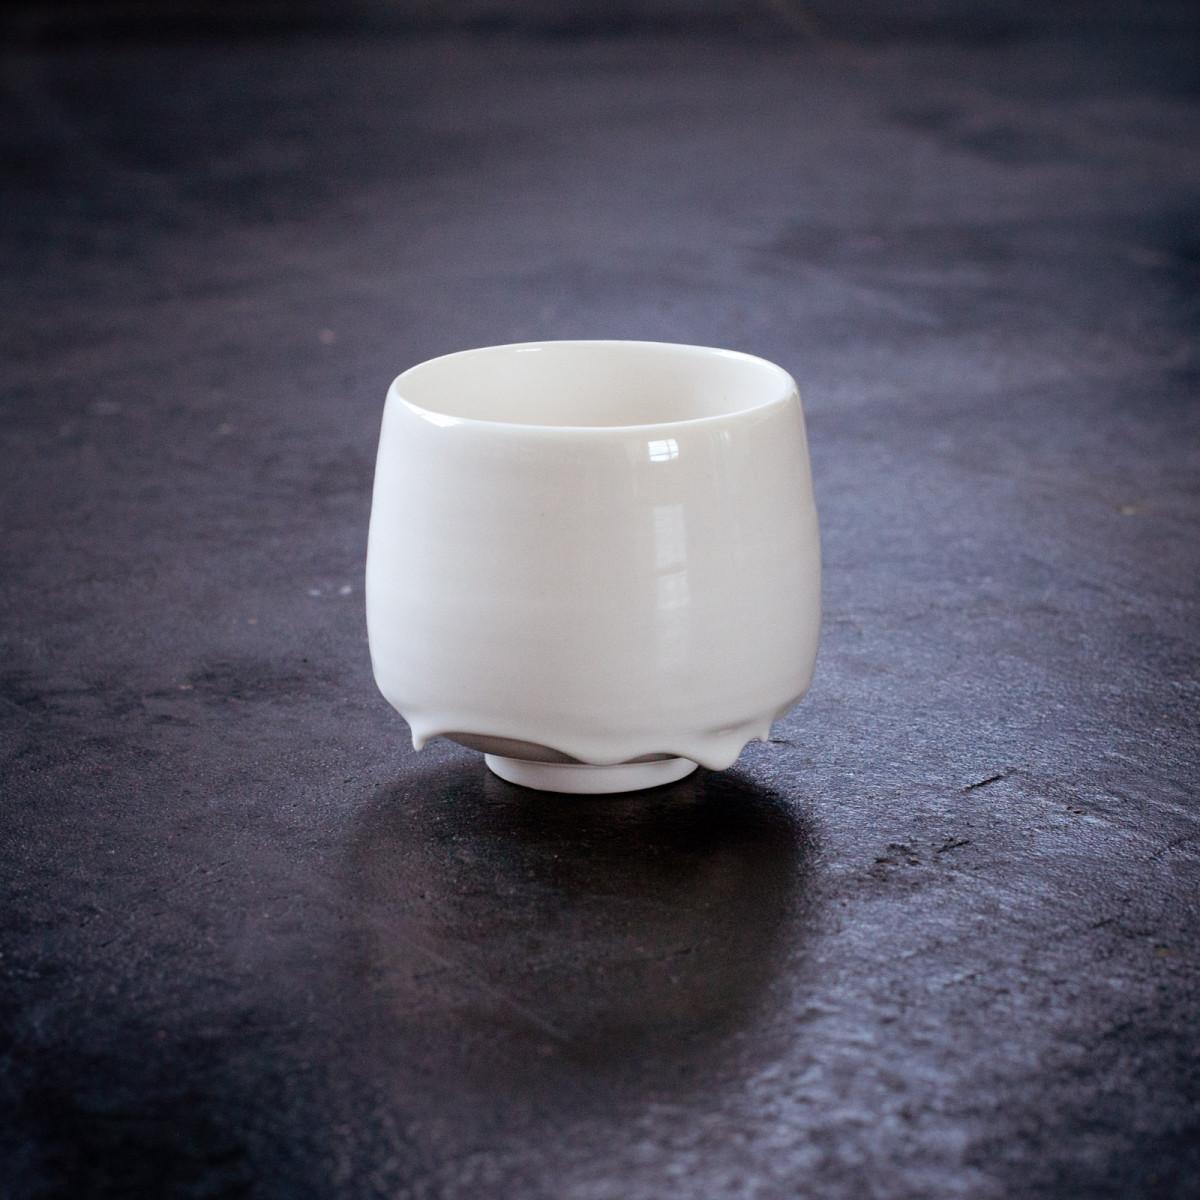 Milan vasek porcelaincup